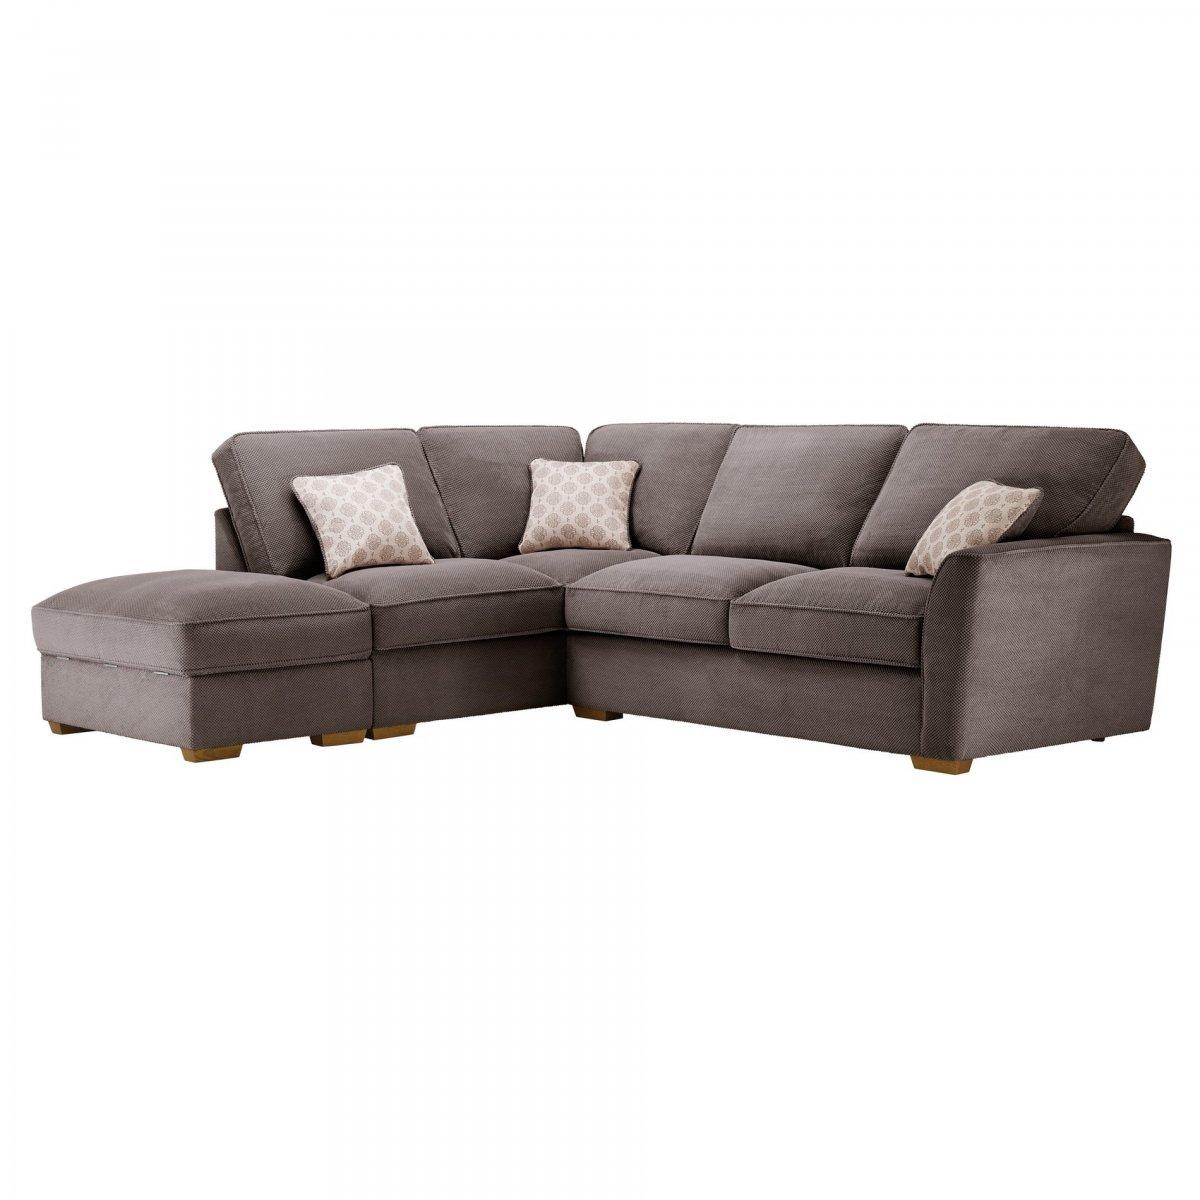 Nebraska Right Hand Corner Sofa With High Back In Aero